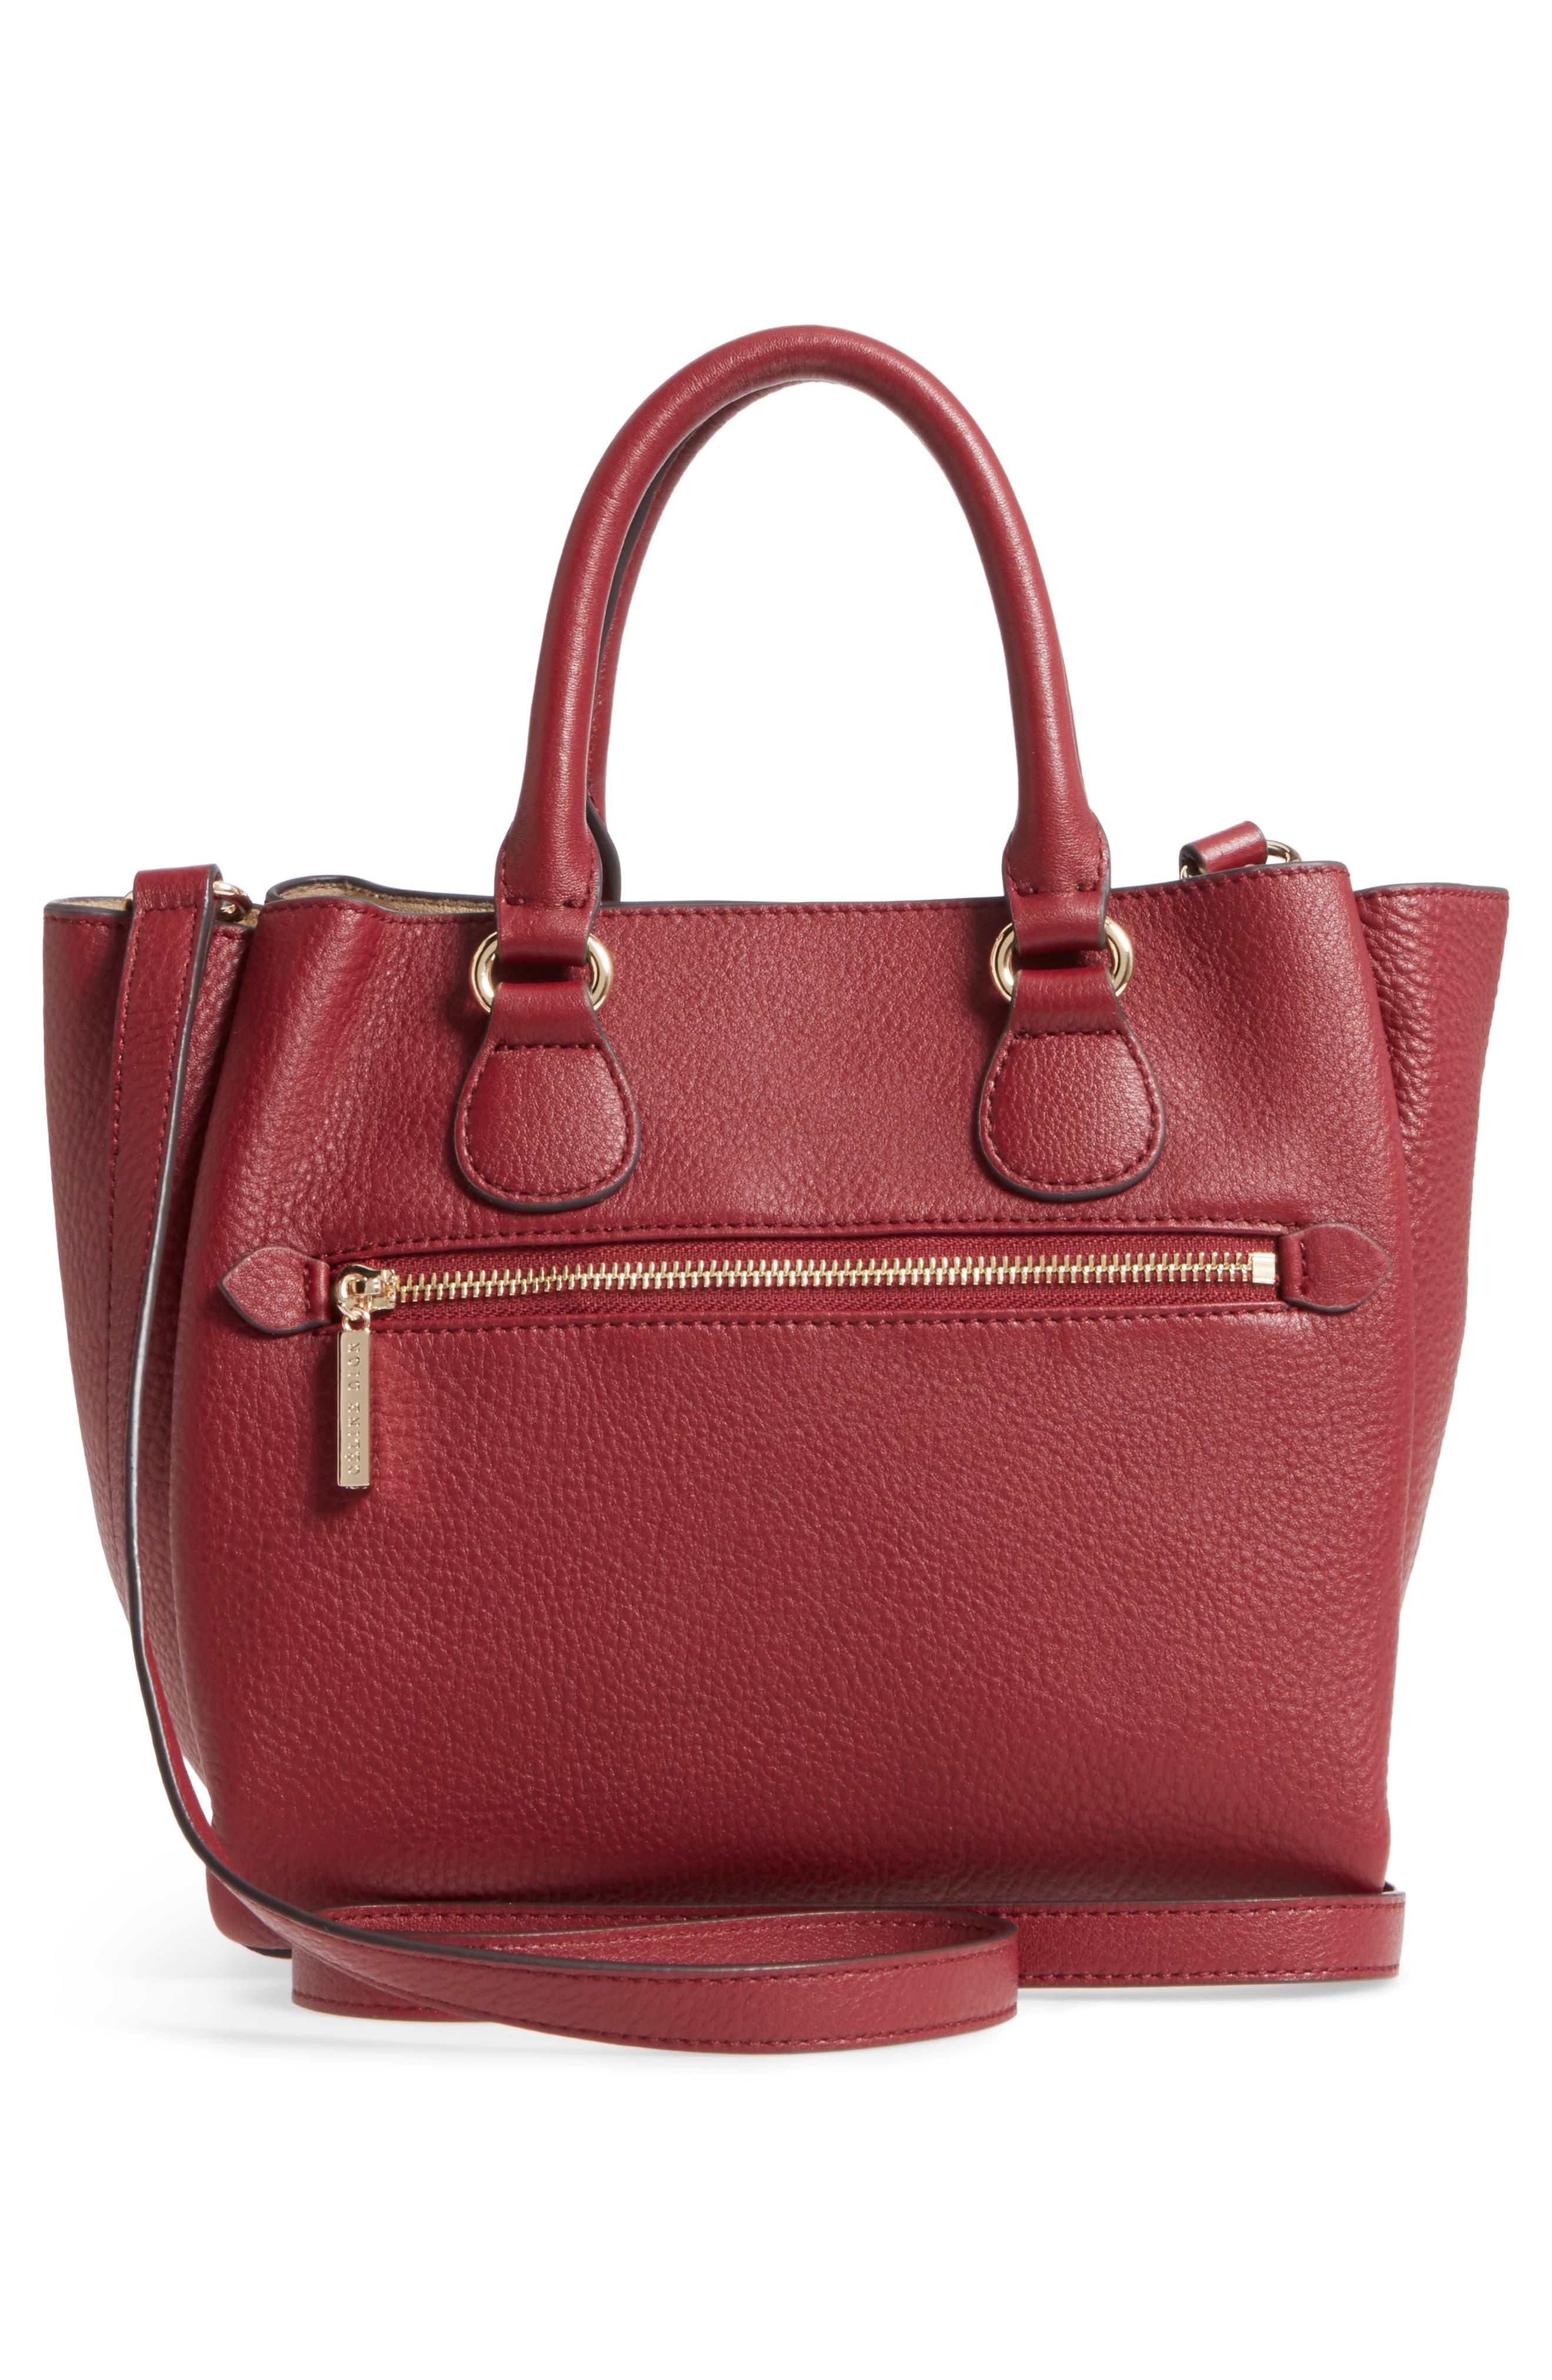 Céline Dion Small Adagio Leather Satchel,                             Alternate thumbnail 15, color,